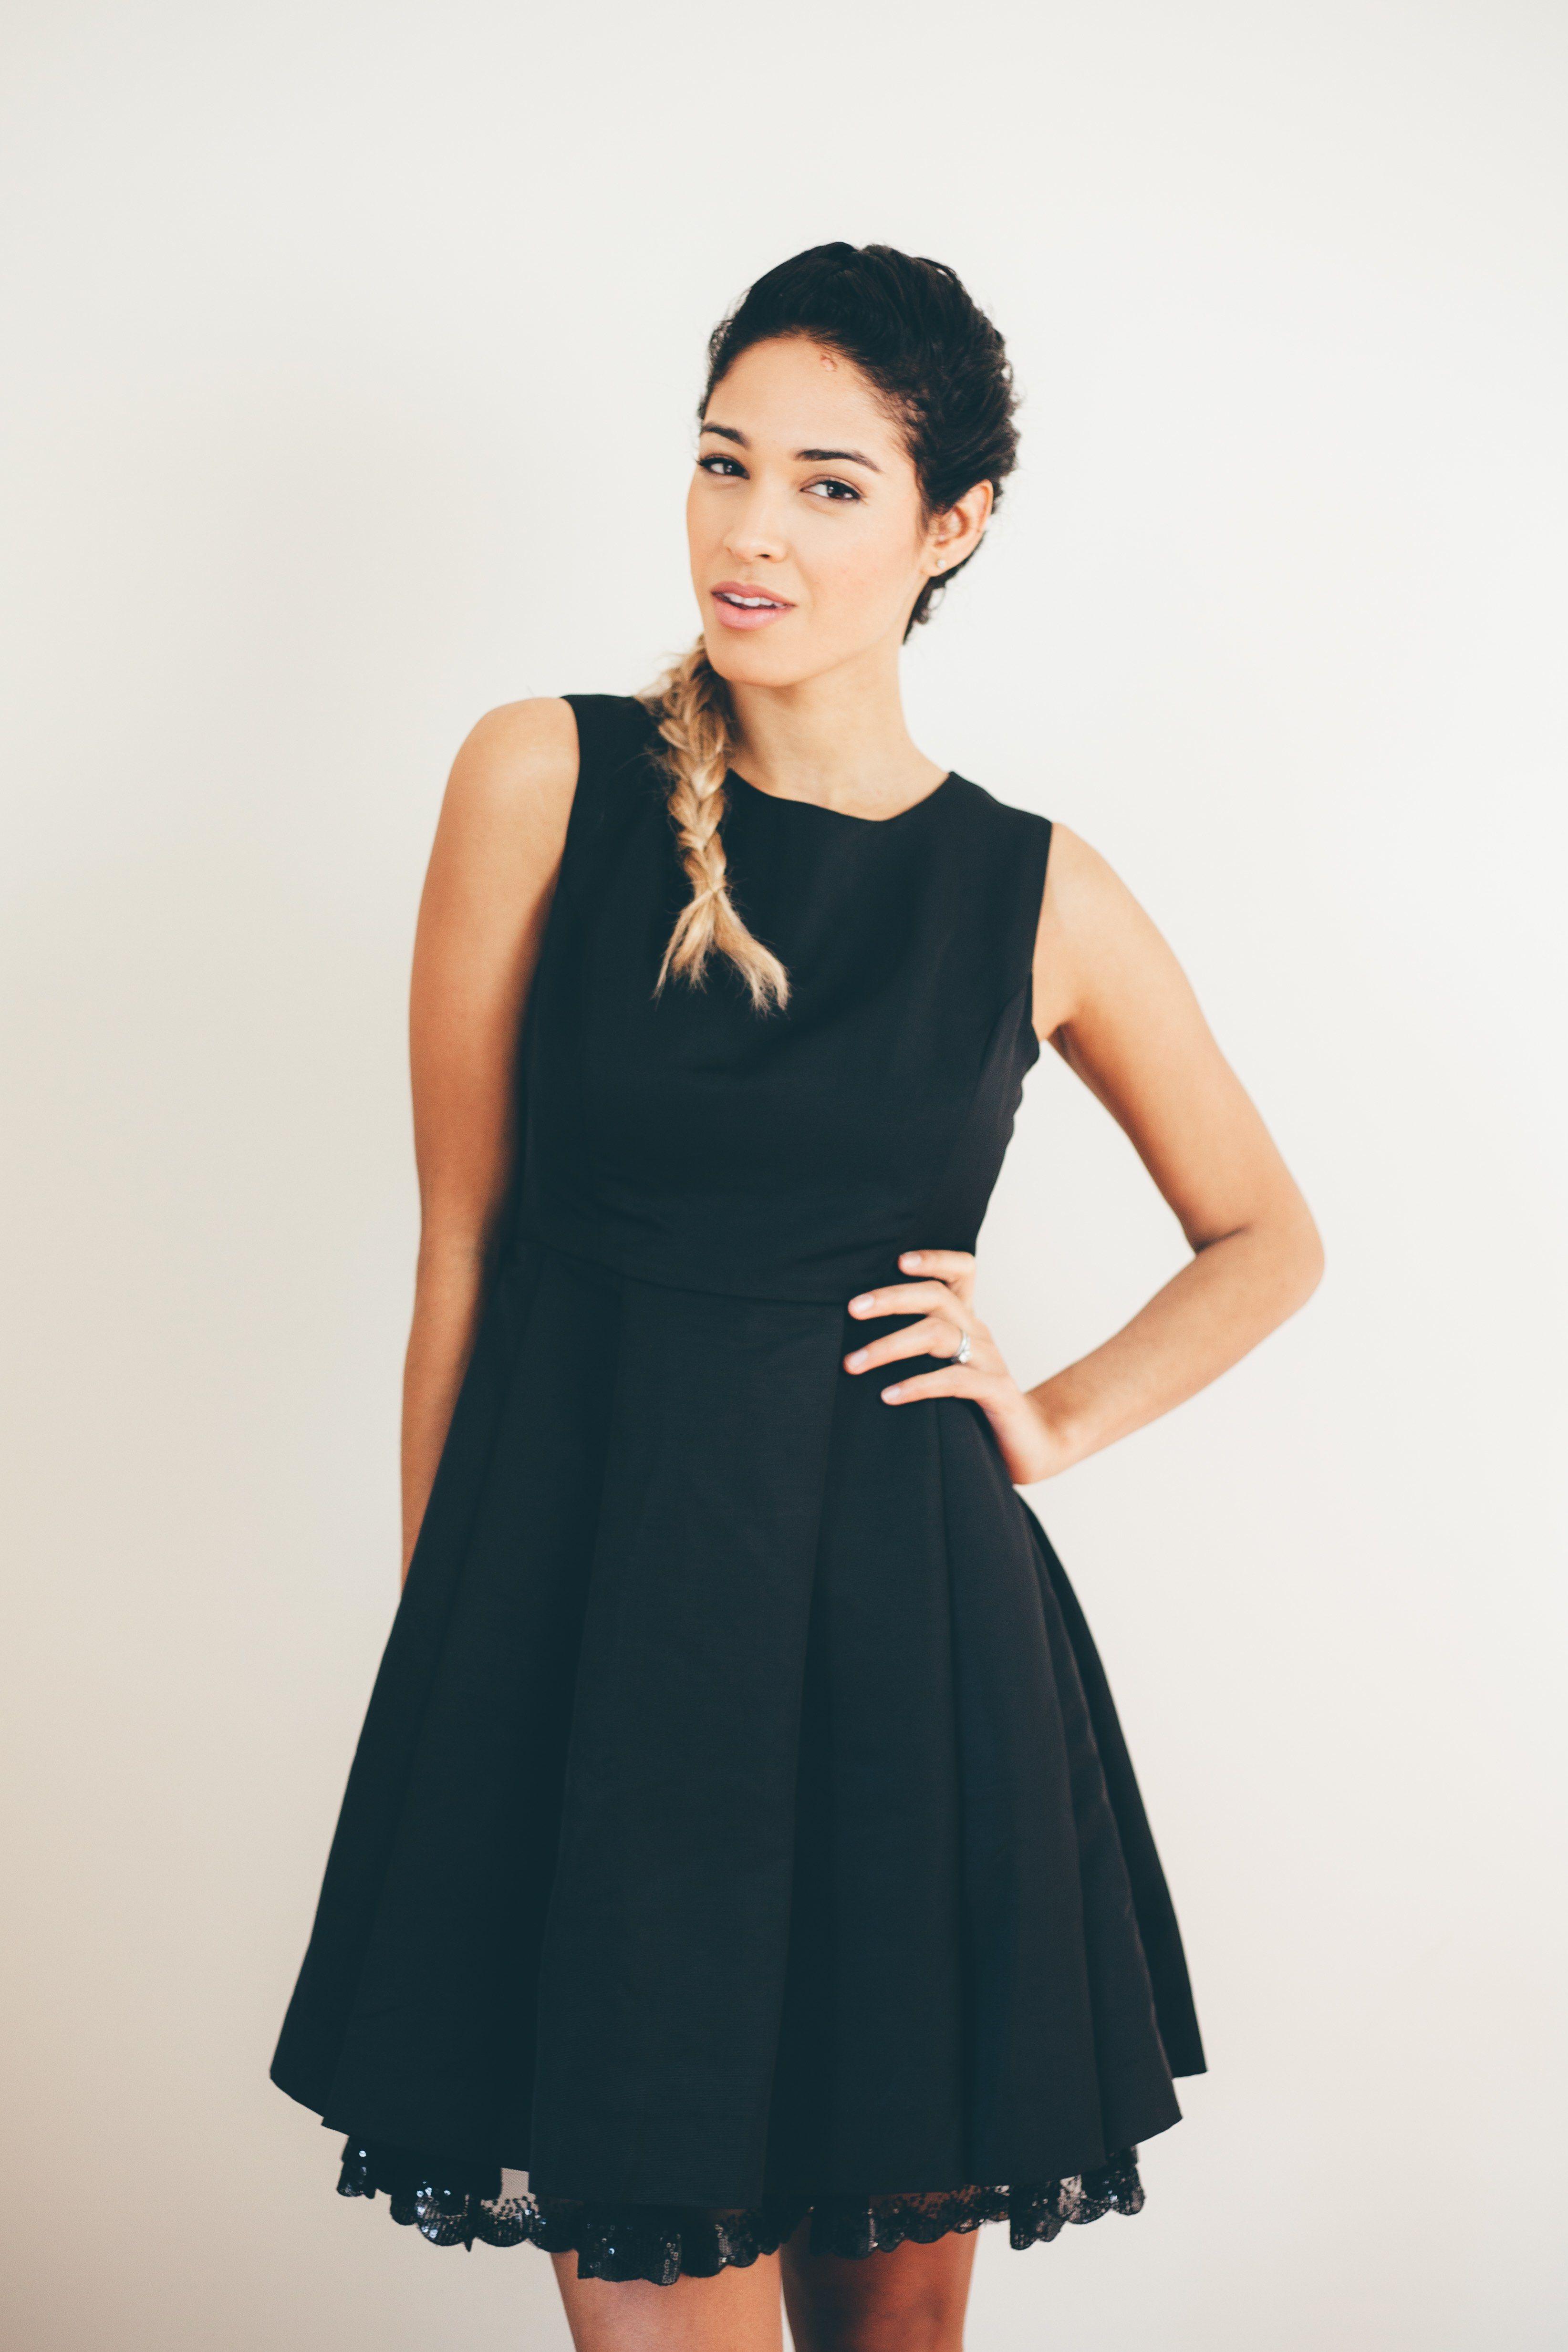 Jason Wu For Target Black Mini Cocktail Dress Size 6 S Dresses Lil Black Dress Mini Cocktail Dress [ 4931 x 3287 Pixel ]